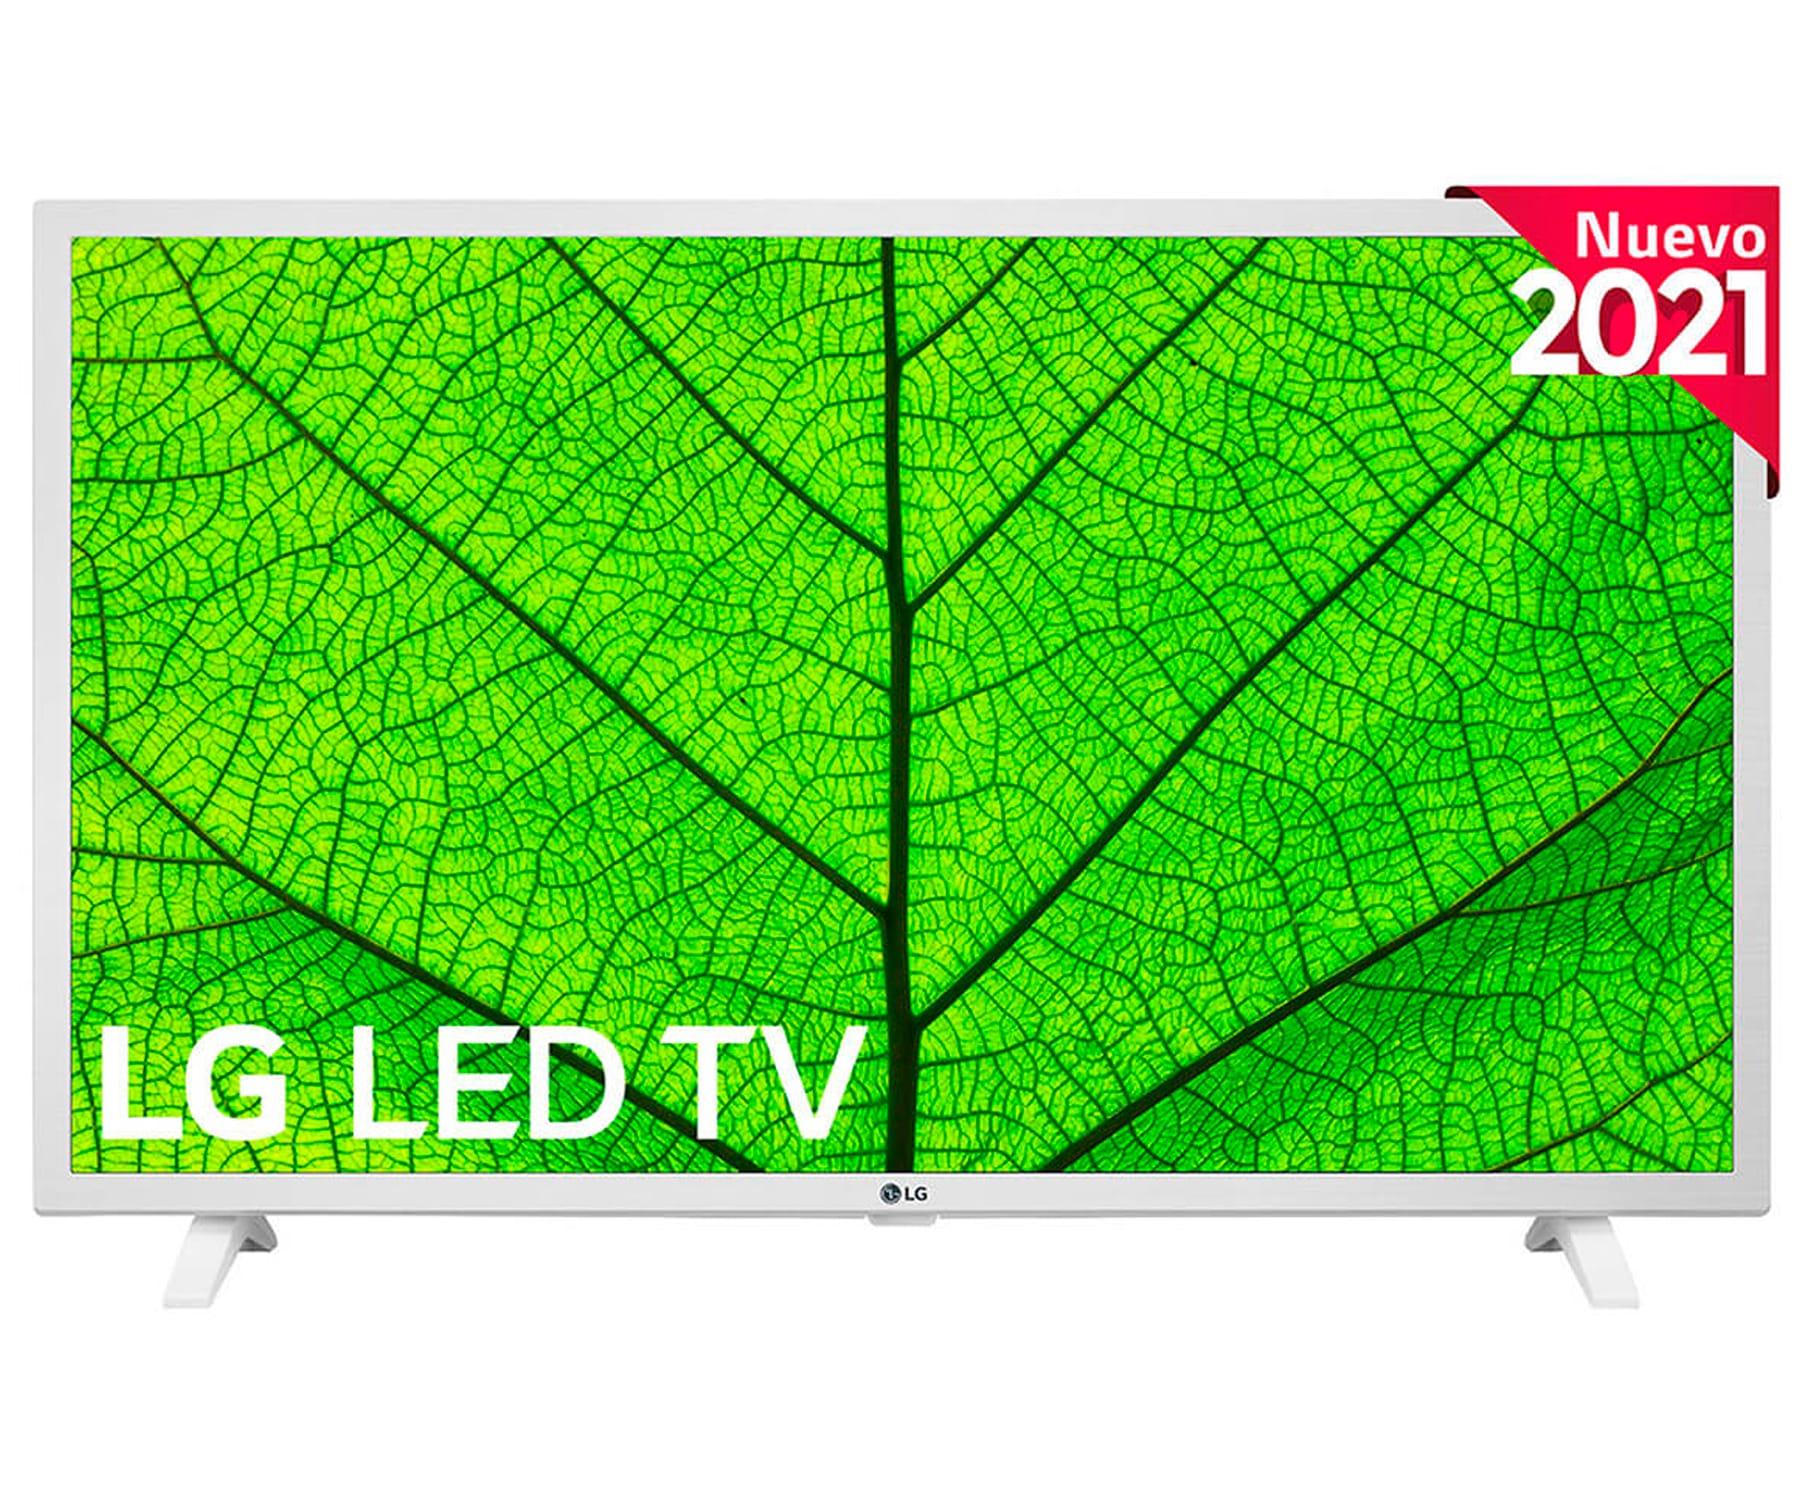 "LG 32LM6380PLC TELEVISOR BLANCO SMART TV 32"" FULL HD HDR"